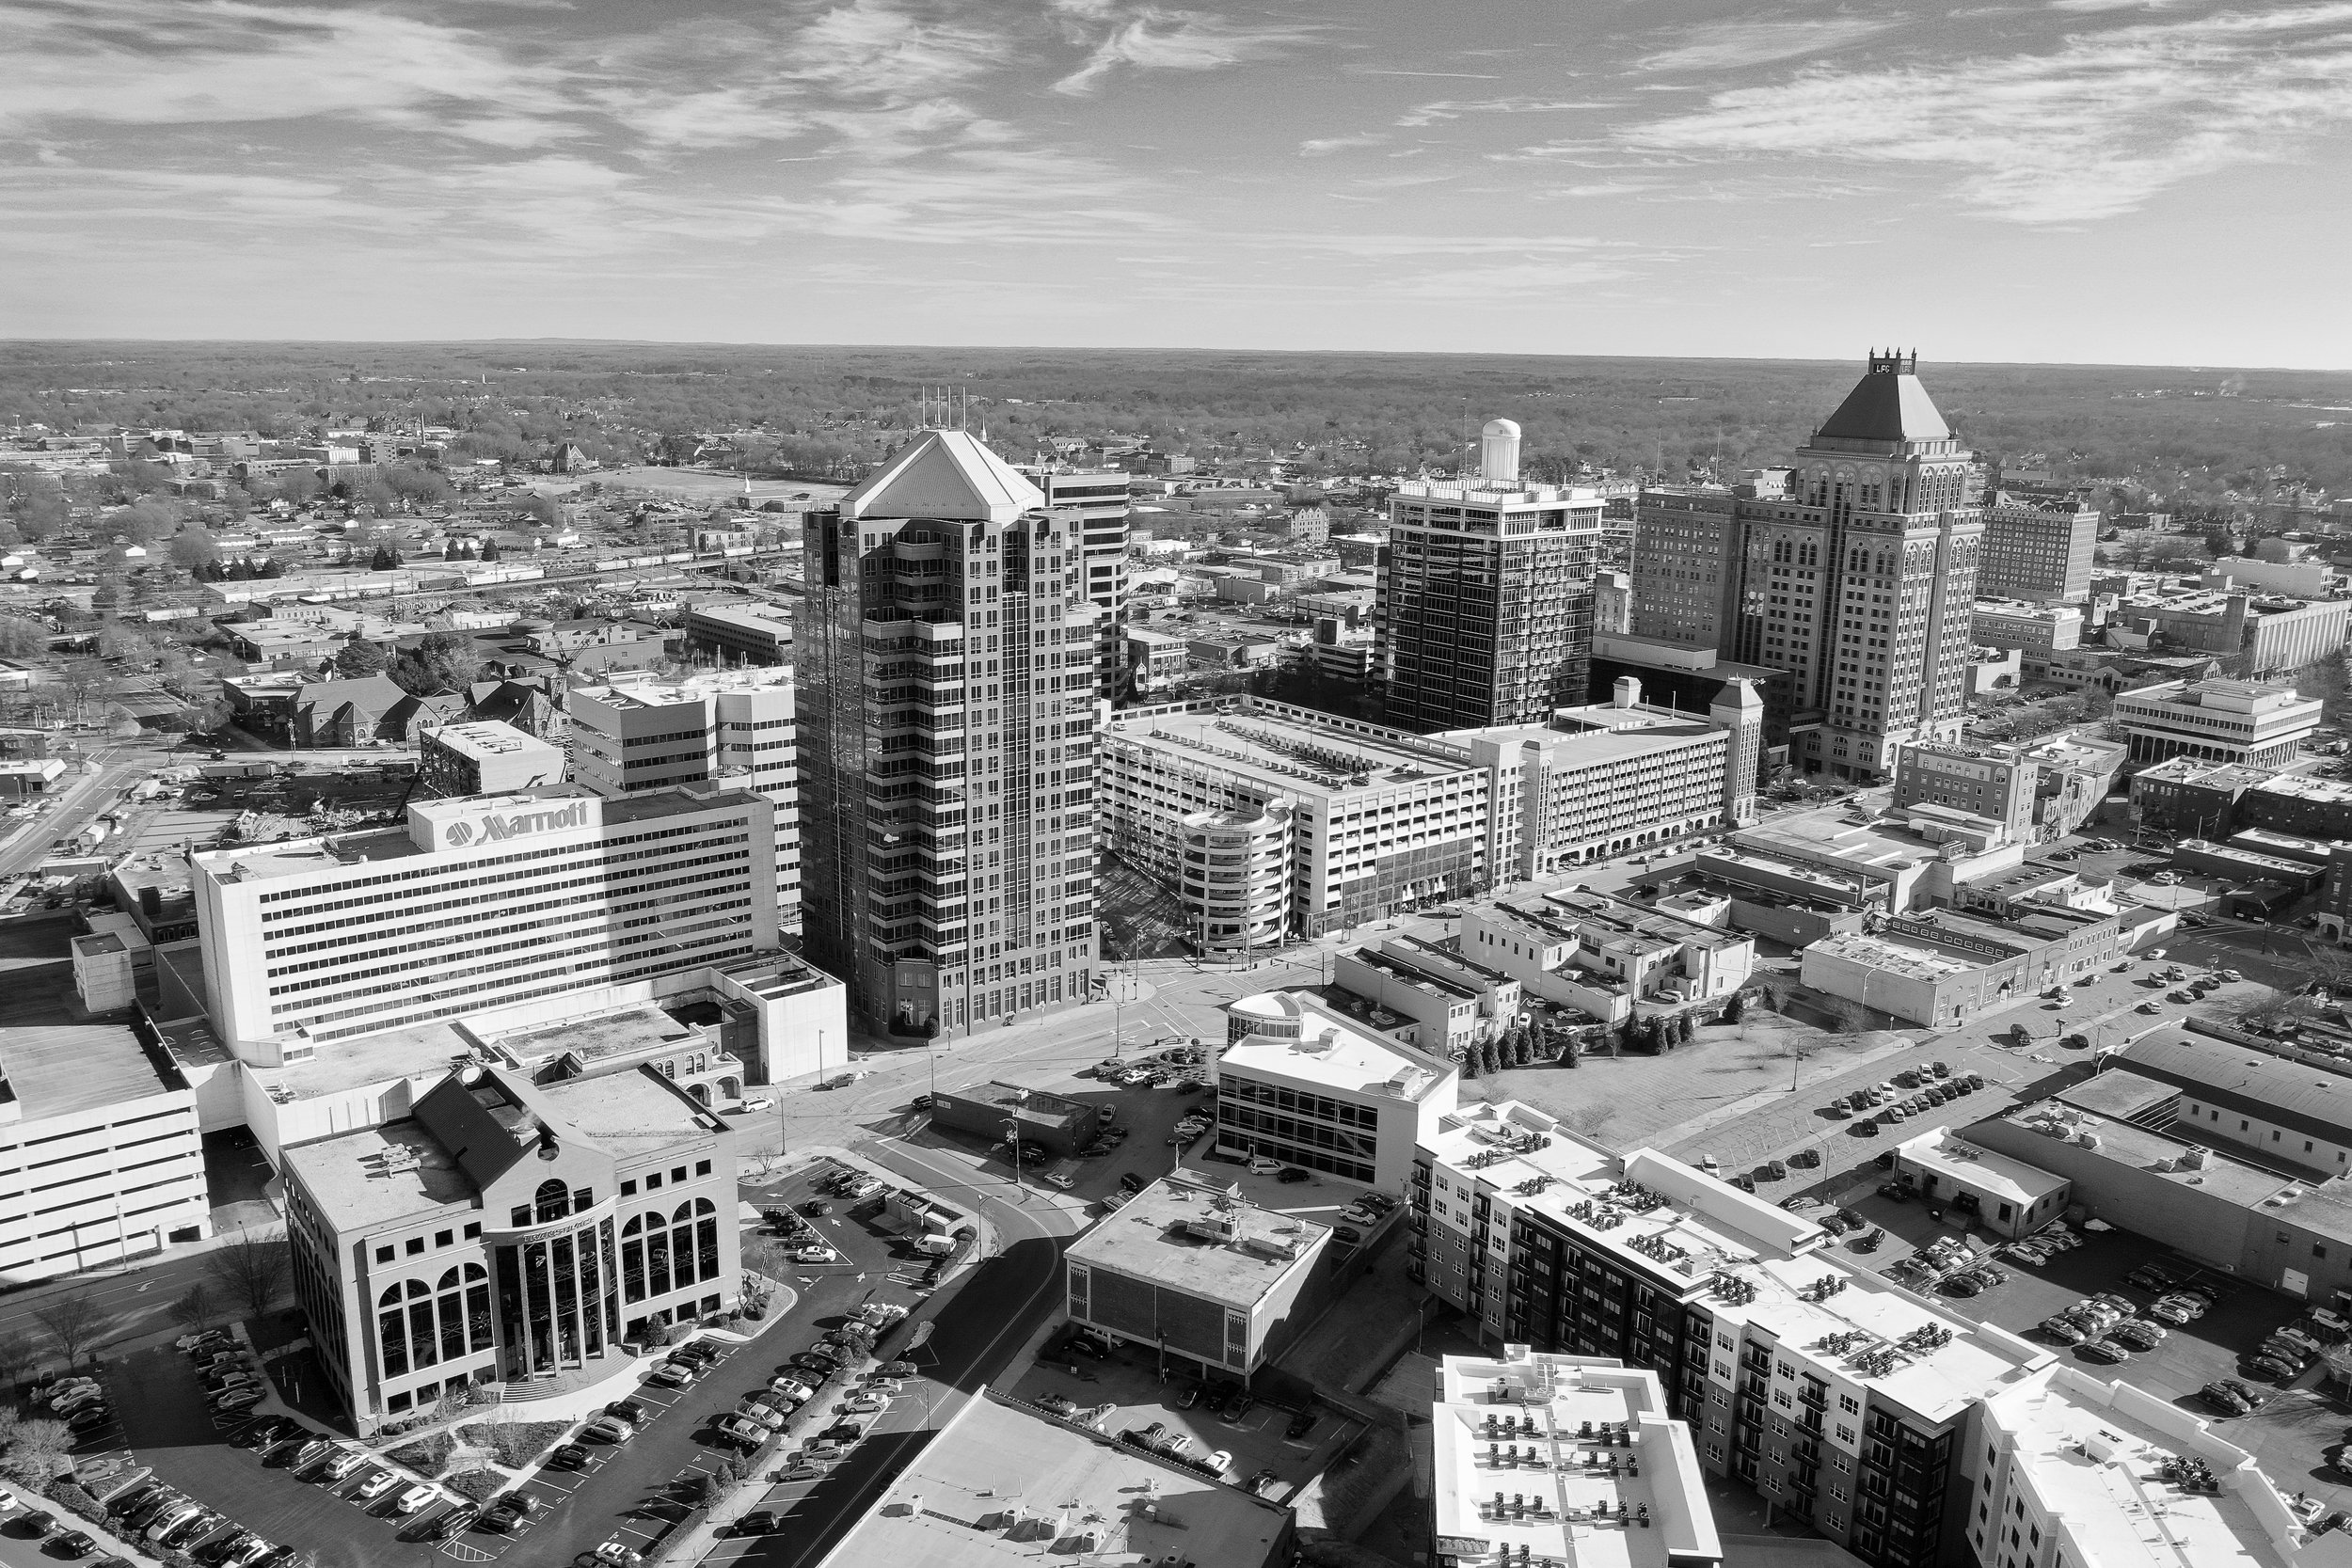 DowntownGreensboro_BW.jpg